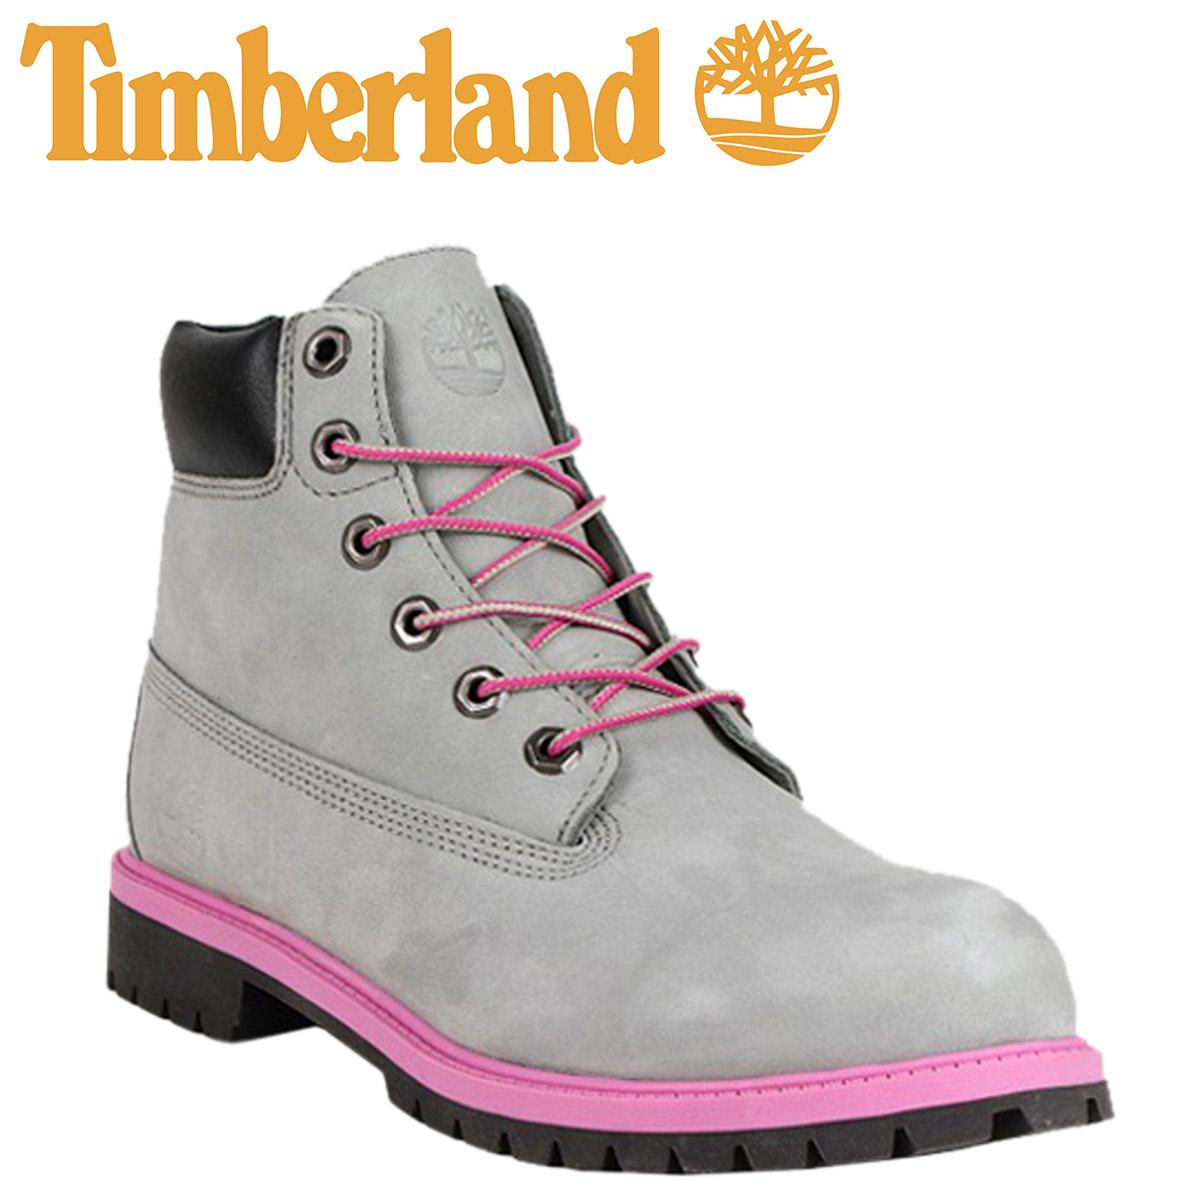 e3181771cc048 Timberland Timberland 6 inch premium boots 3194R 6INCH PREMIUM BOOT junior  kids child ladies GREY